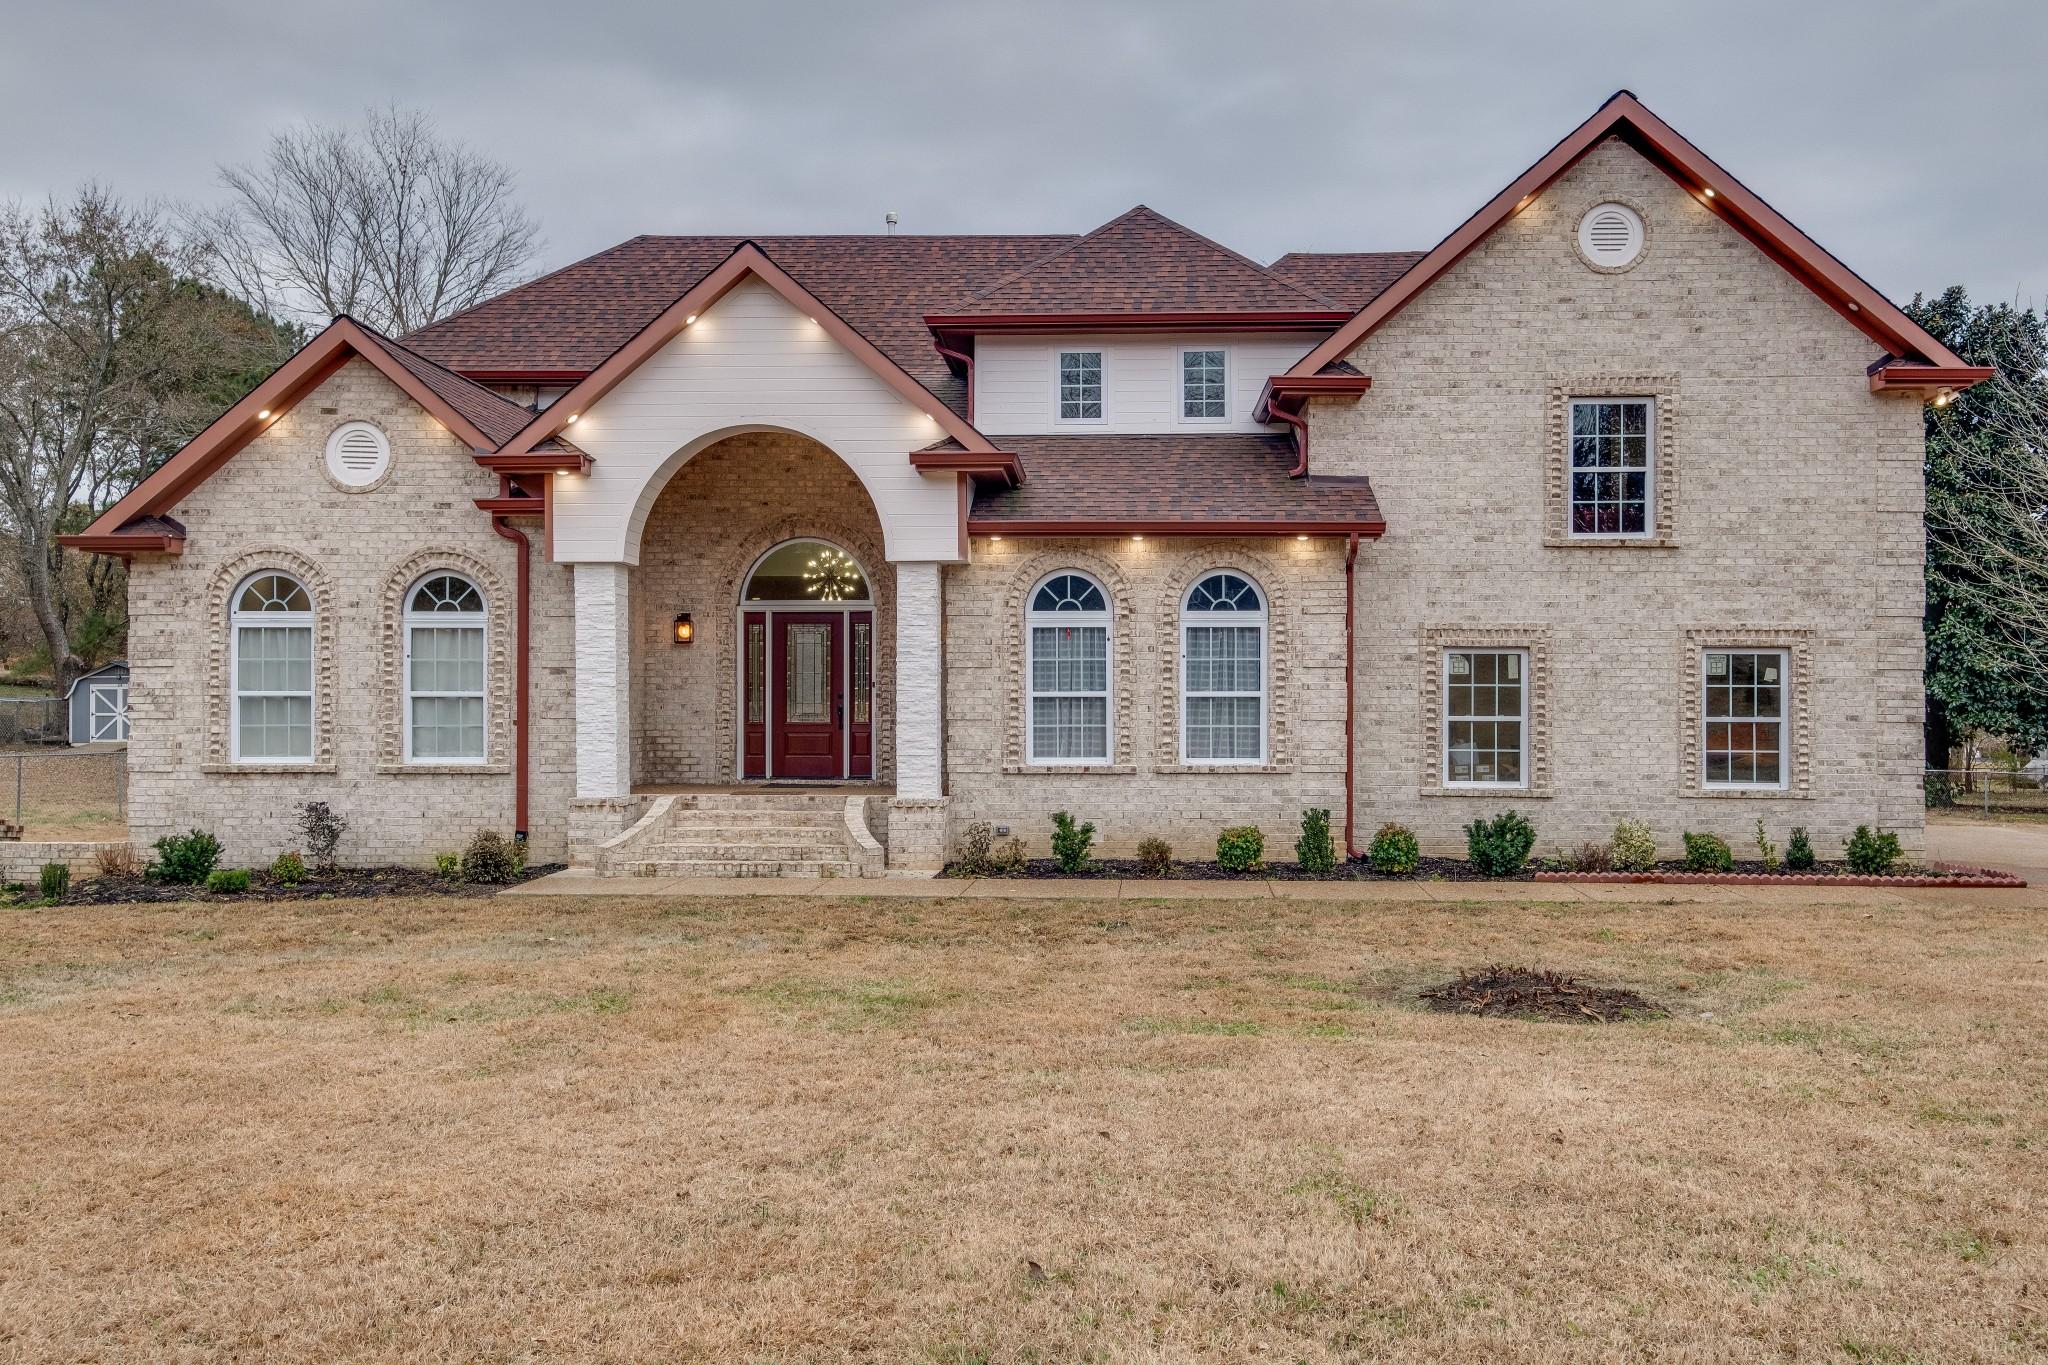 8722 Lebanon Rd, Mount Juliet, TN 37122 - Mount Juliet, TN real estate listing